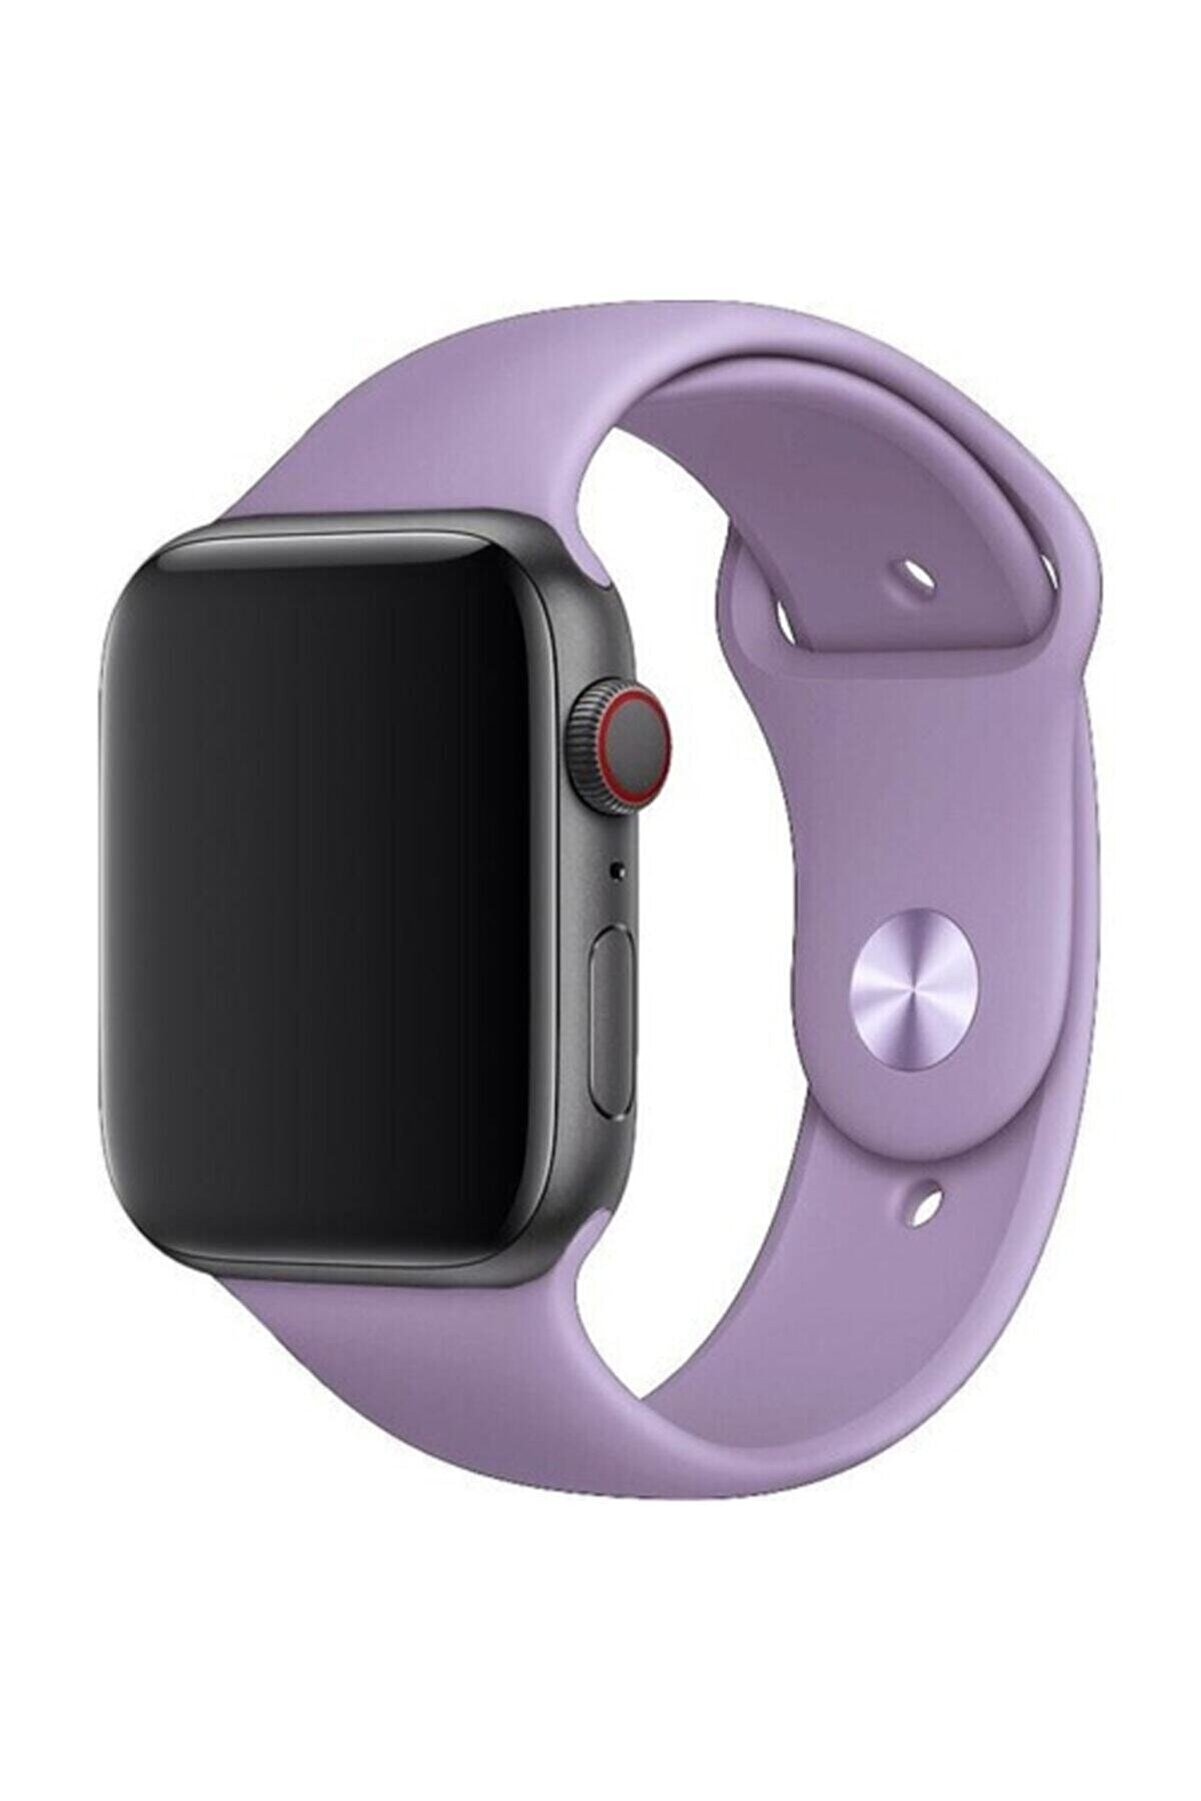 Telehome Apple Watch 38 - 40 Mm Spor Kordon Silikon Kayış Lila